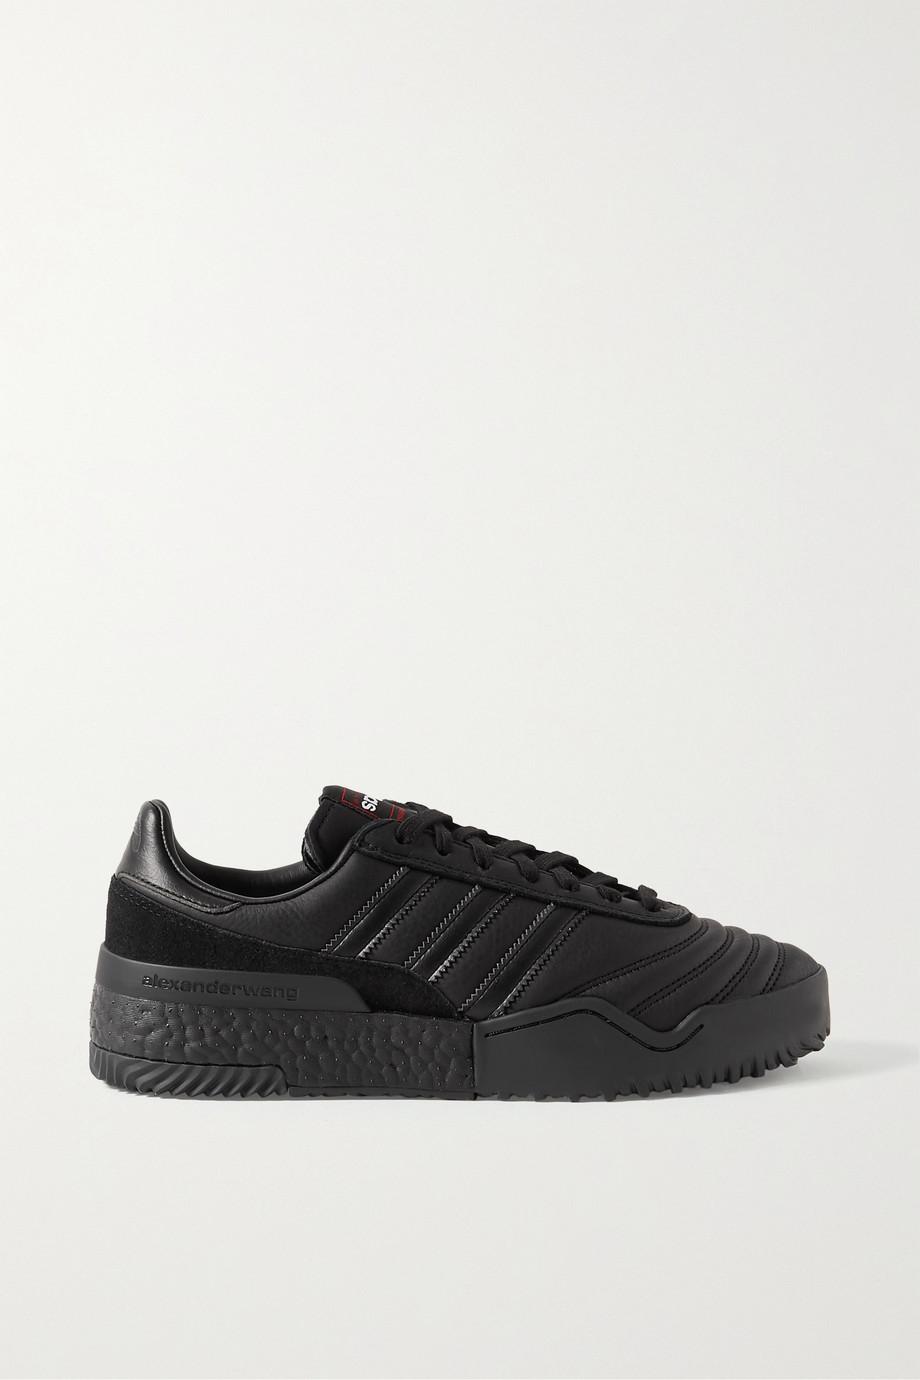 adidas alexander wang nere